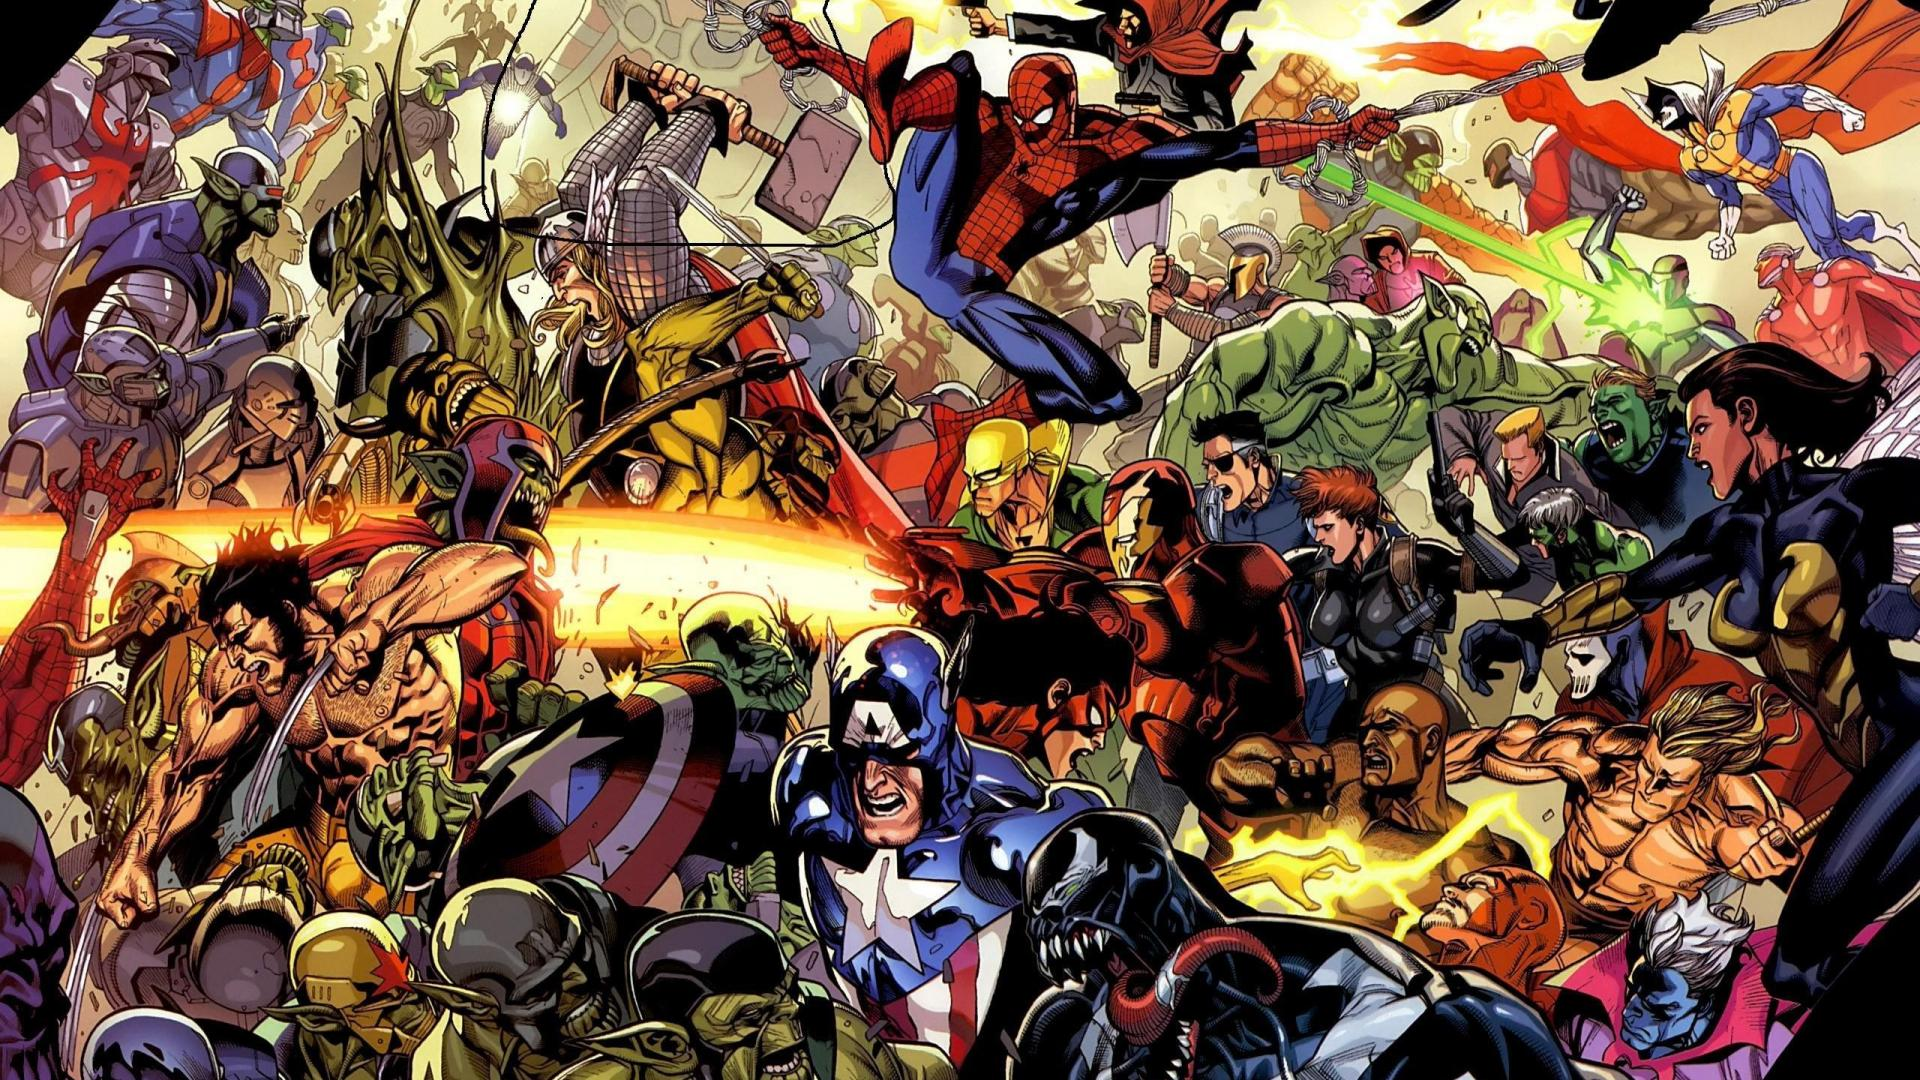 Marvel wallpapers 1920x1080 wallpapersafari - Marvel android wallpaper hd ...